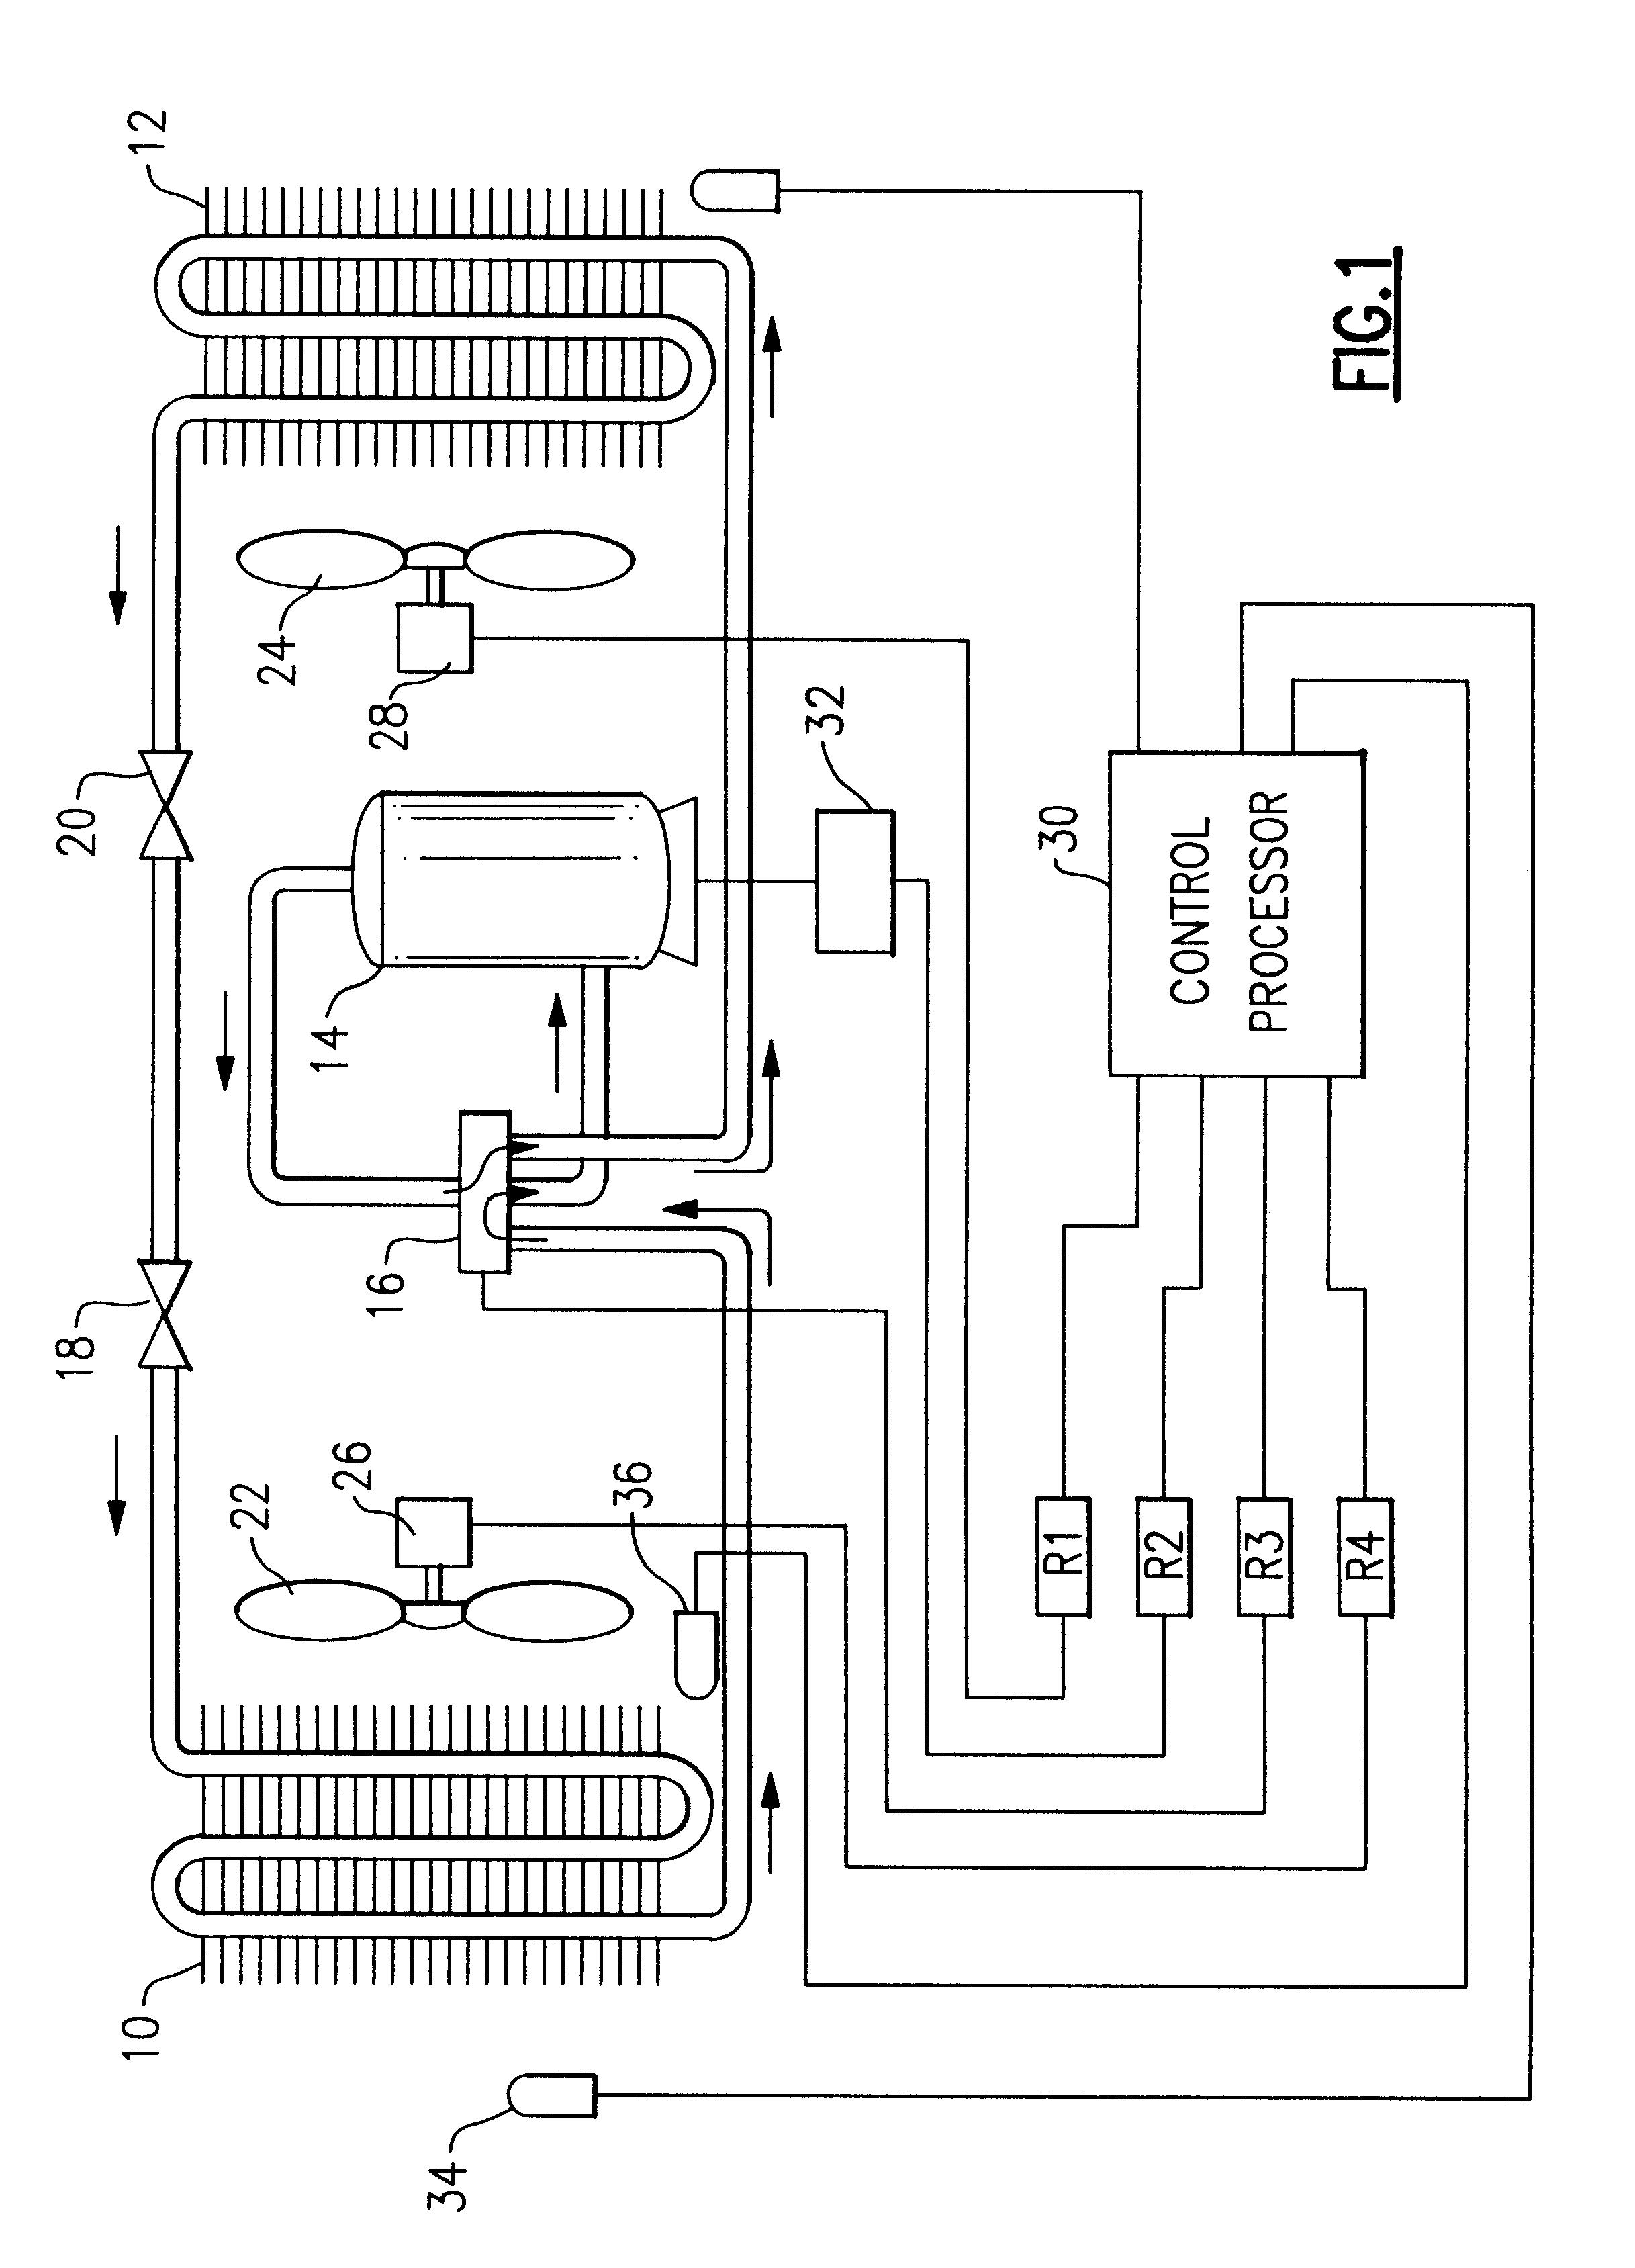 patente us6318095